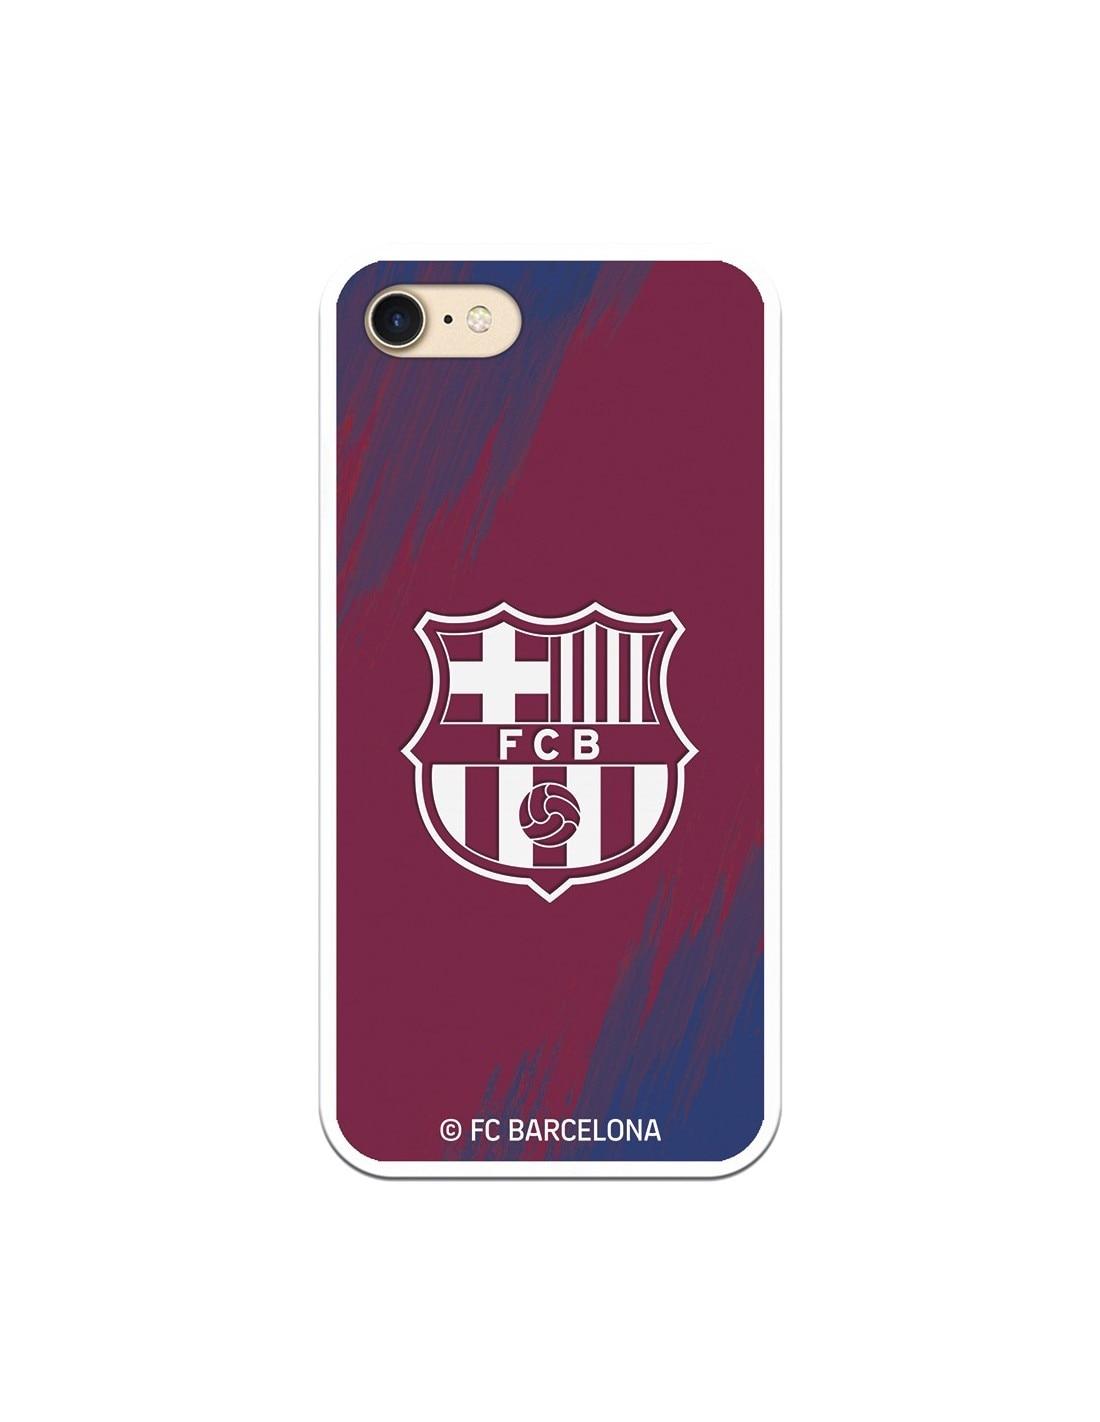 Coque IPhone 7 FC barcelone bouclier fond blanc tache-licence officielle FC barcelone